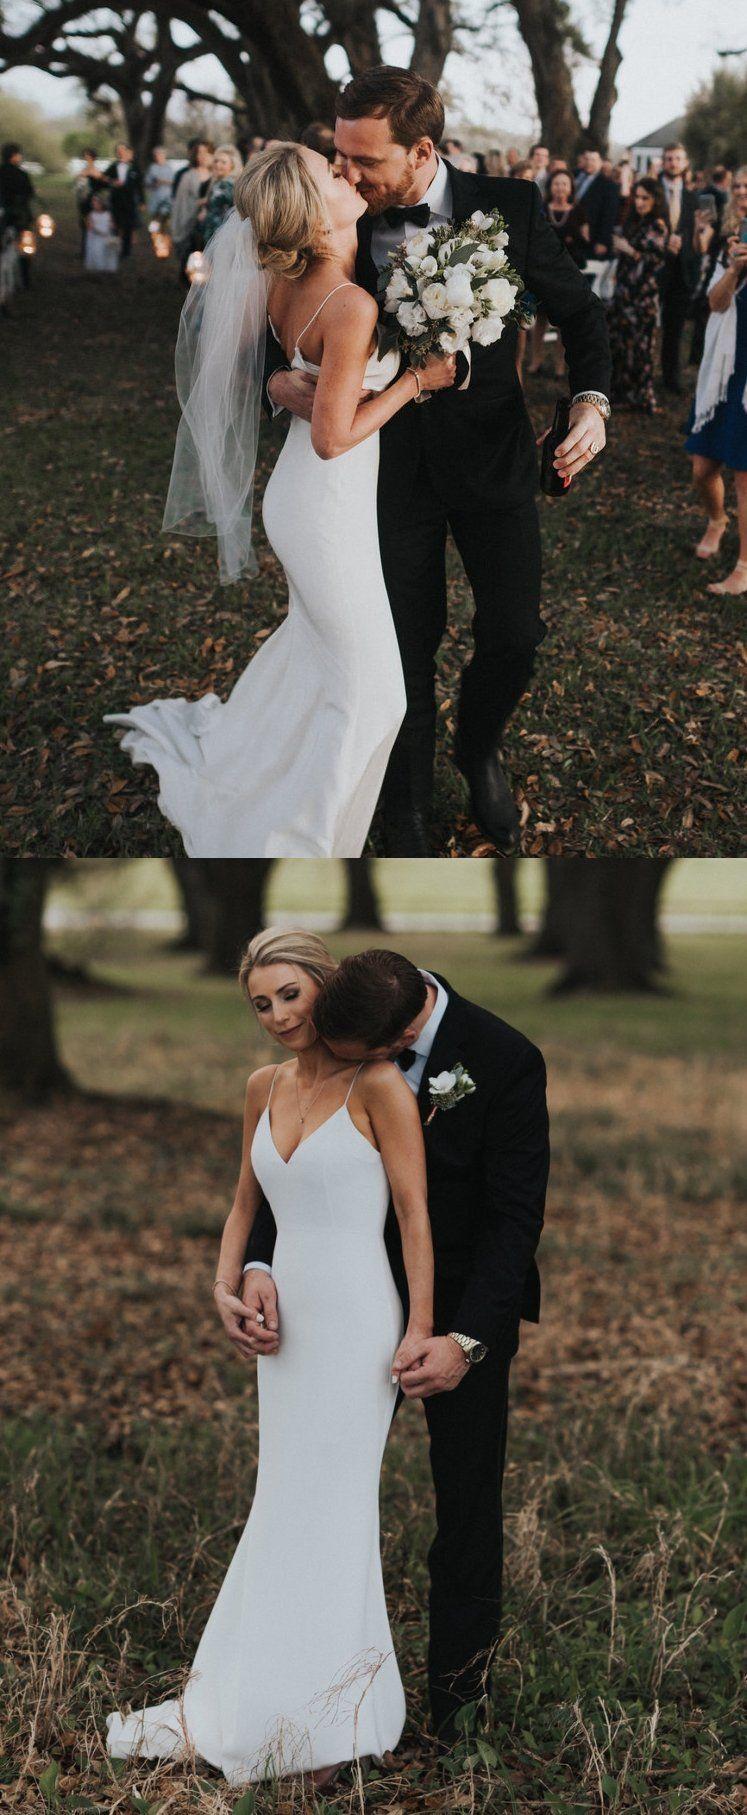 Spaghetti straps memraid backless satin chiffon white vneck wedding